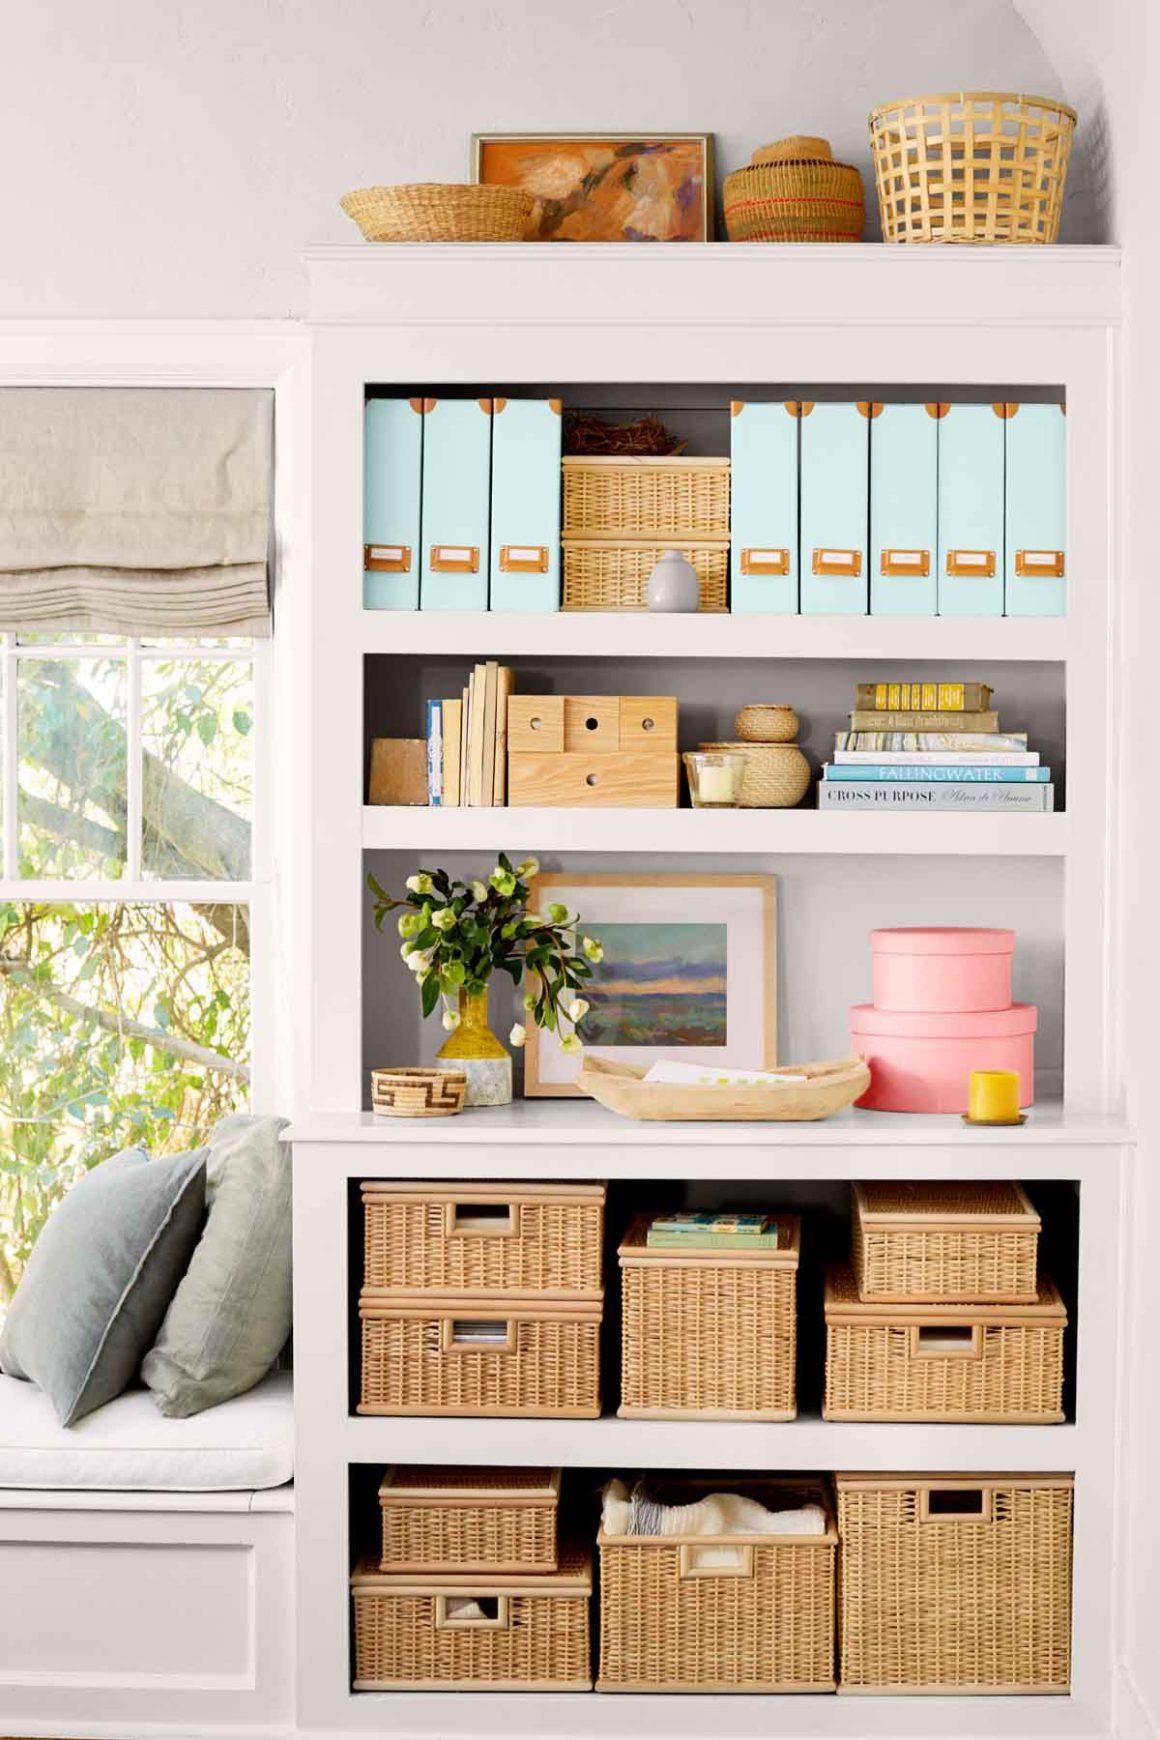 small apartment decorating ideas - organizing system